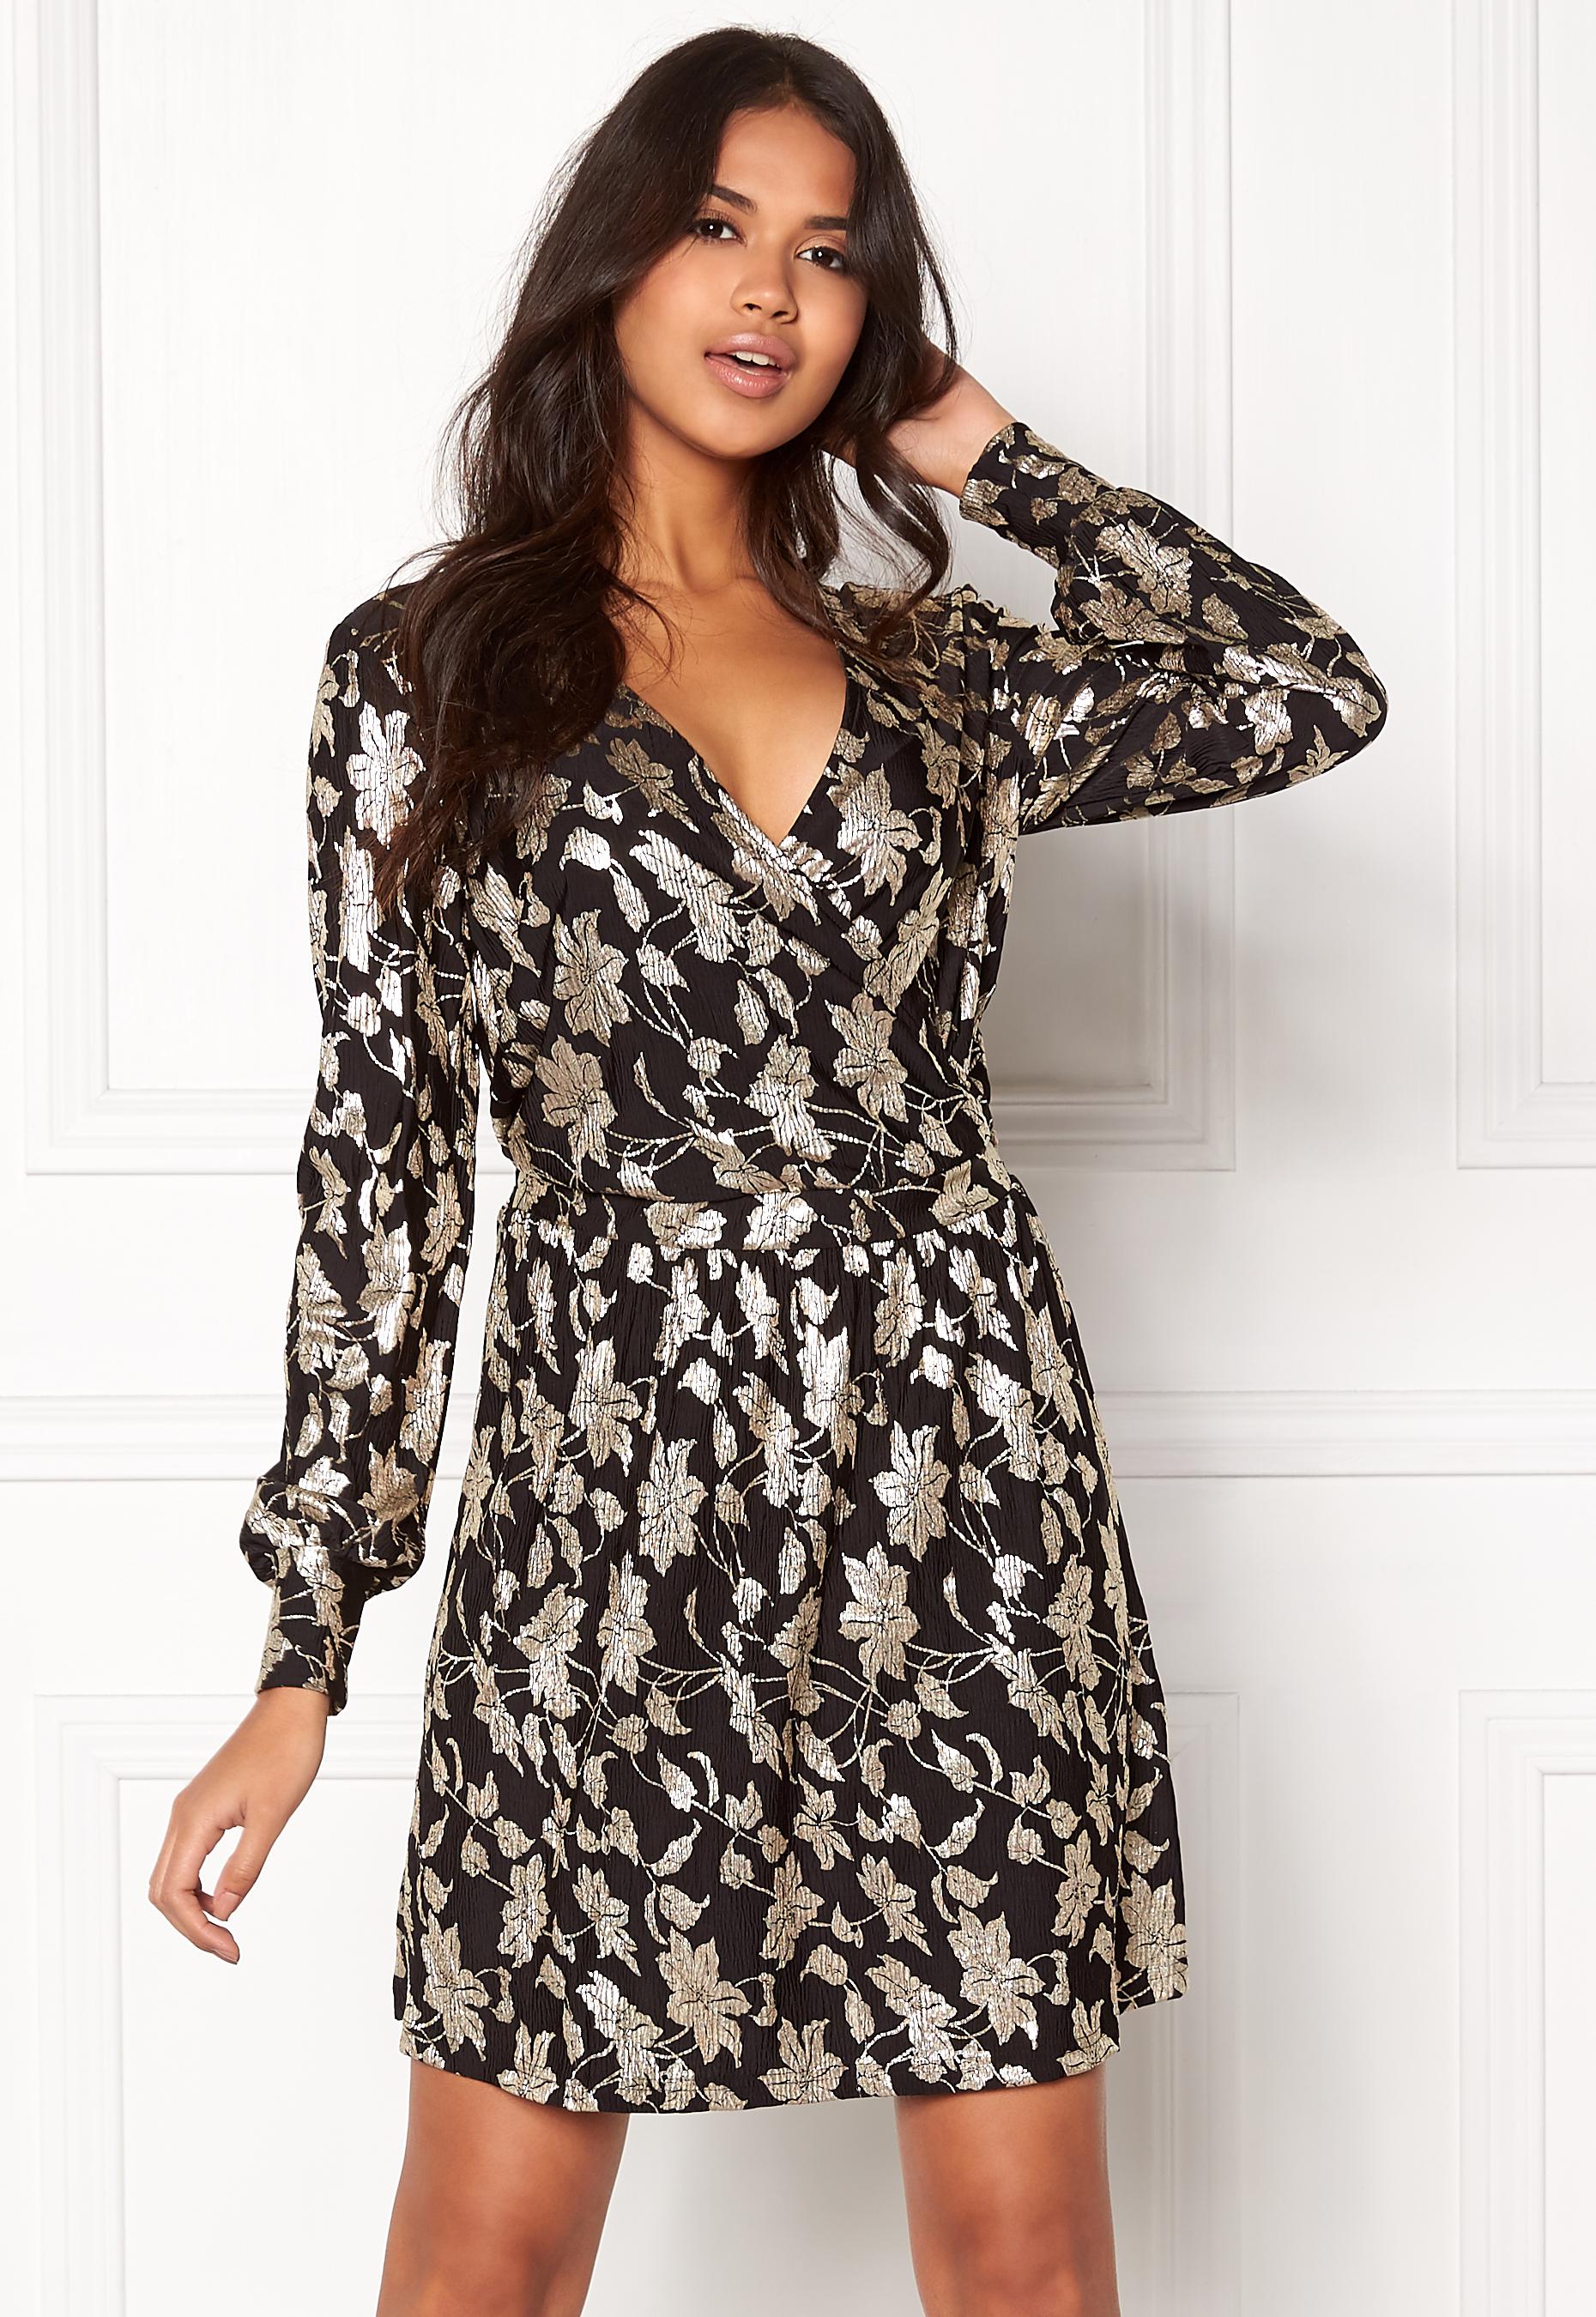 bff7776c1b2f VERO MODA Romeo LS Wrap Short Dress Black - Bubbleroom